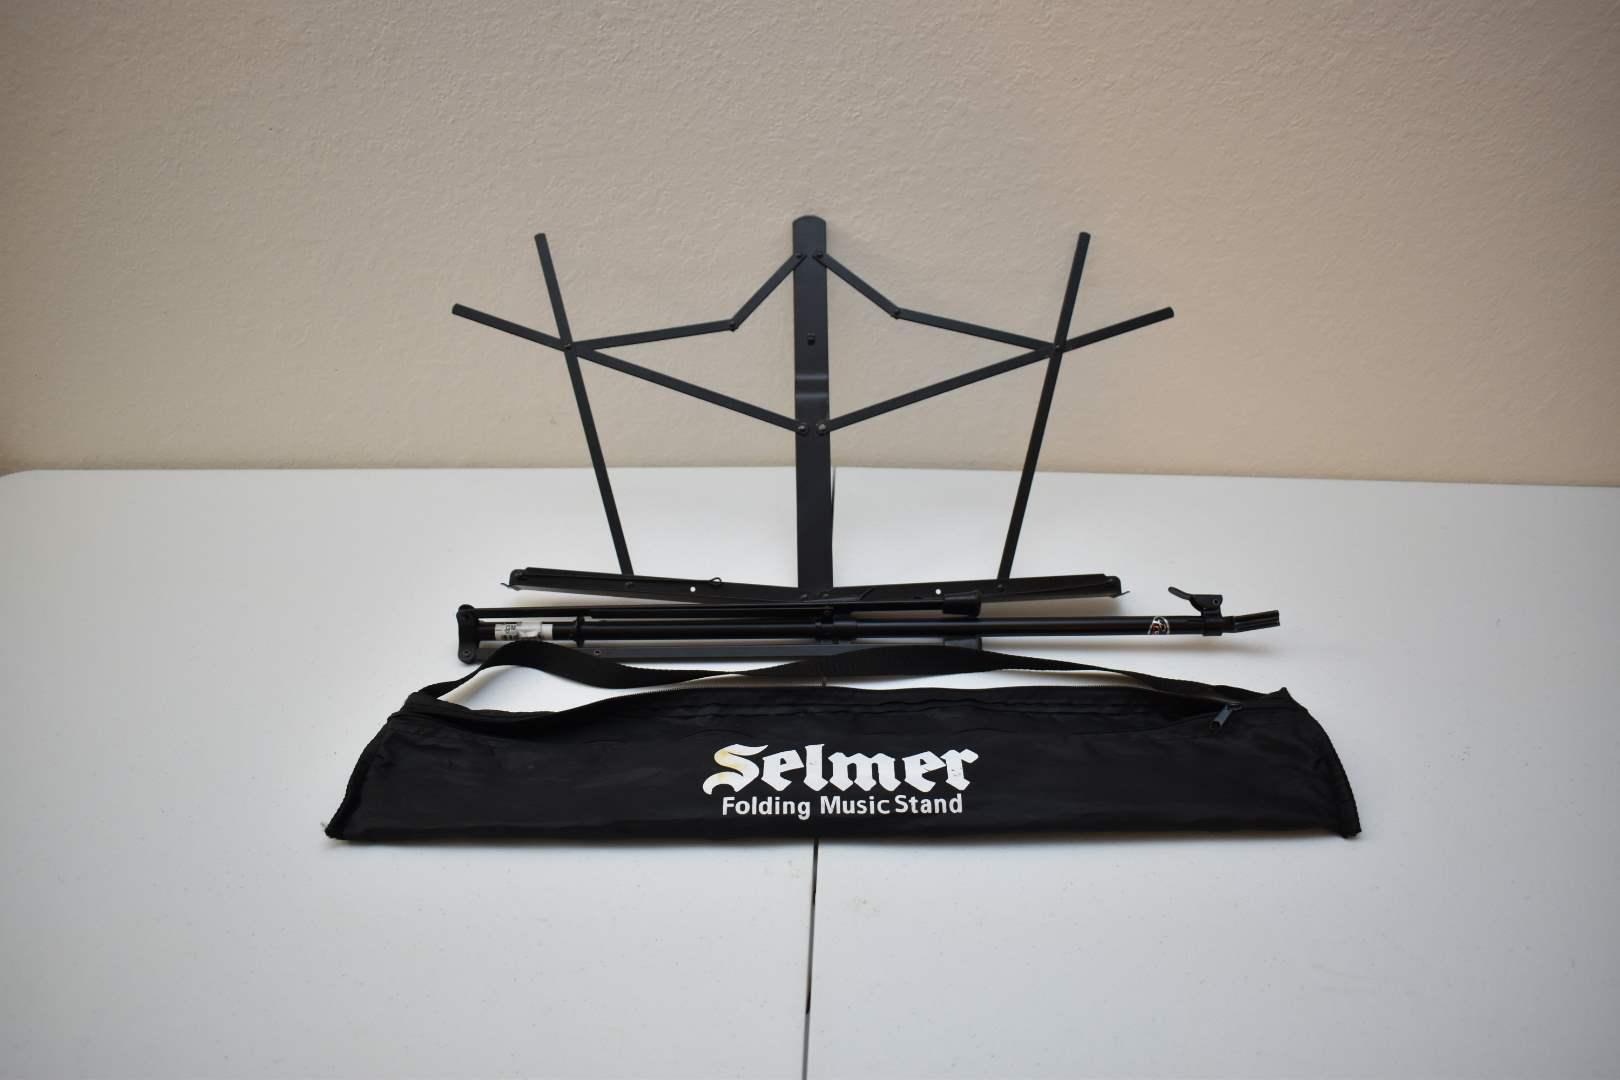 Selmer Folding Music Stand (black)